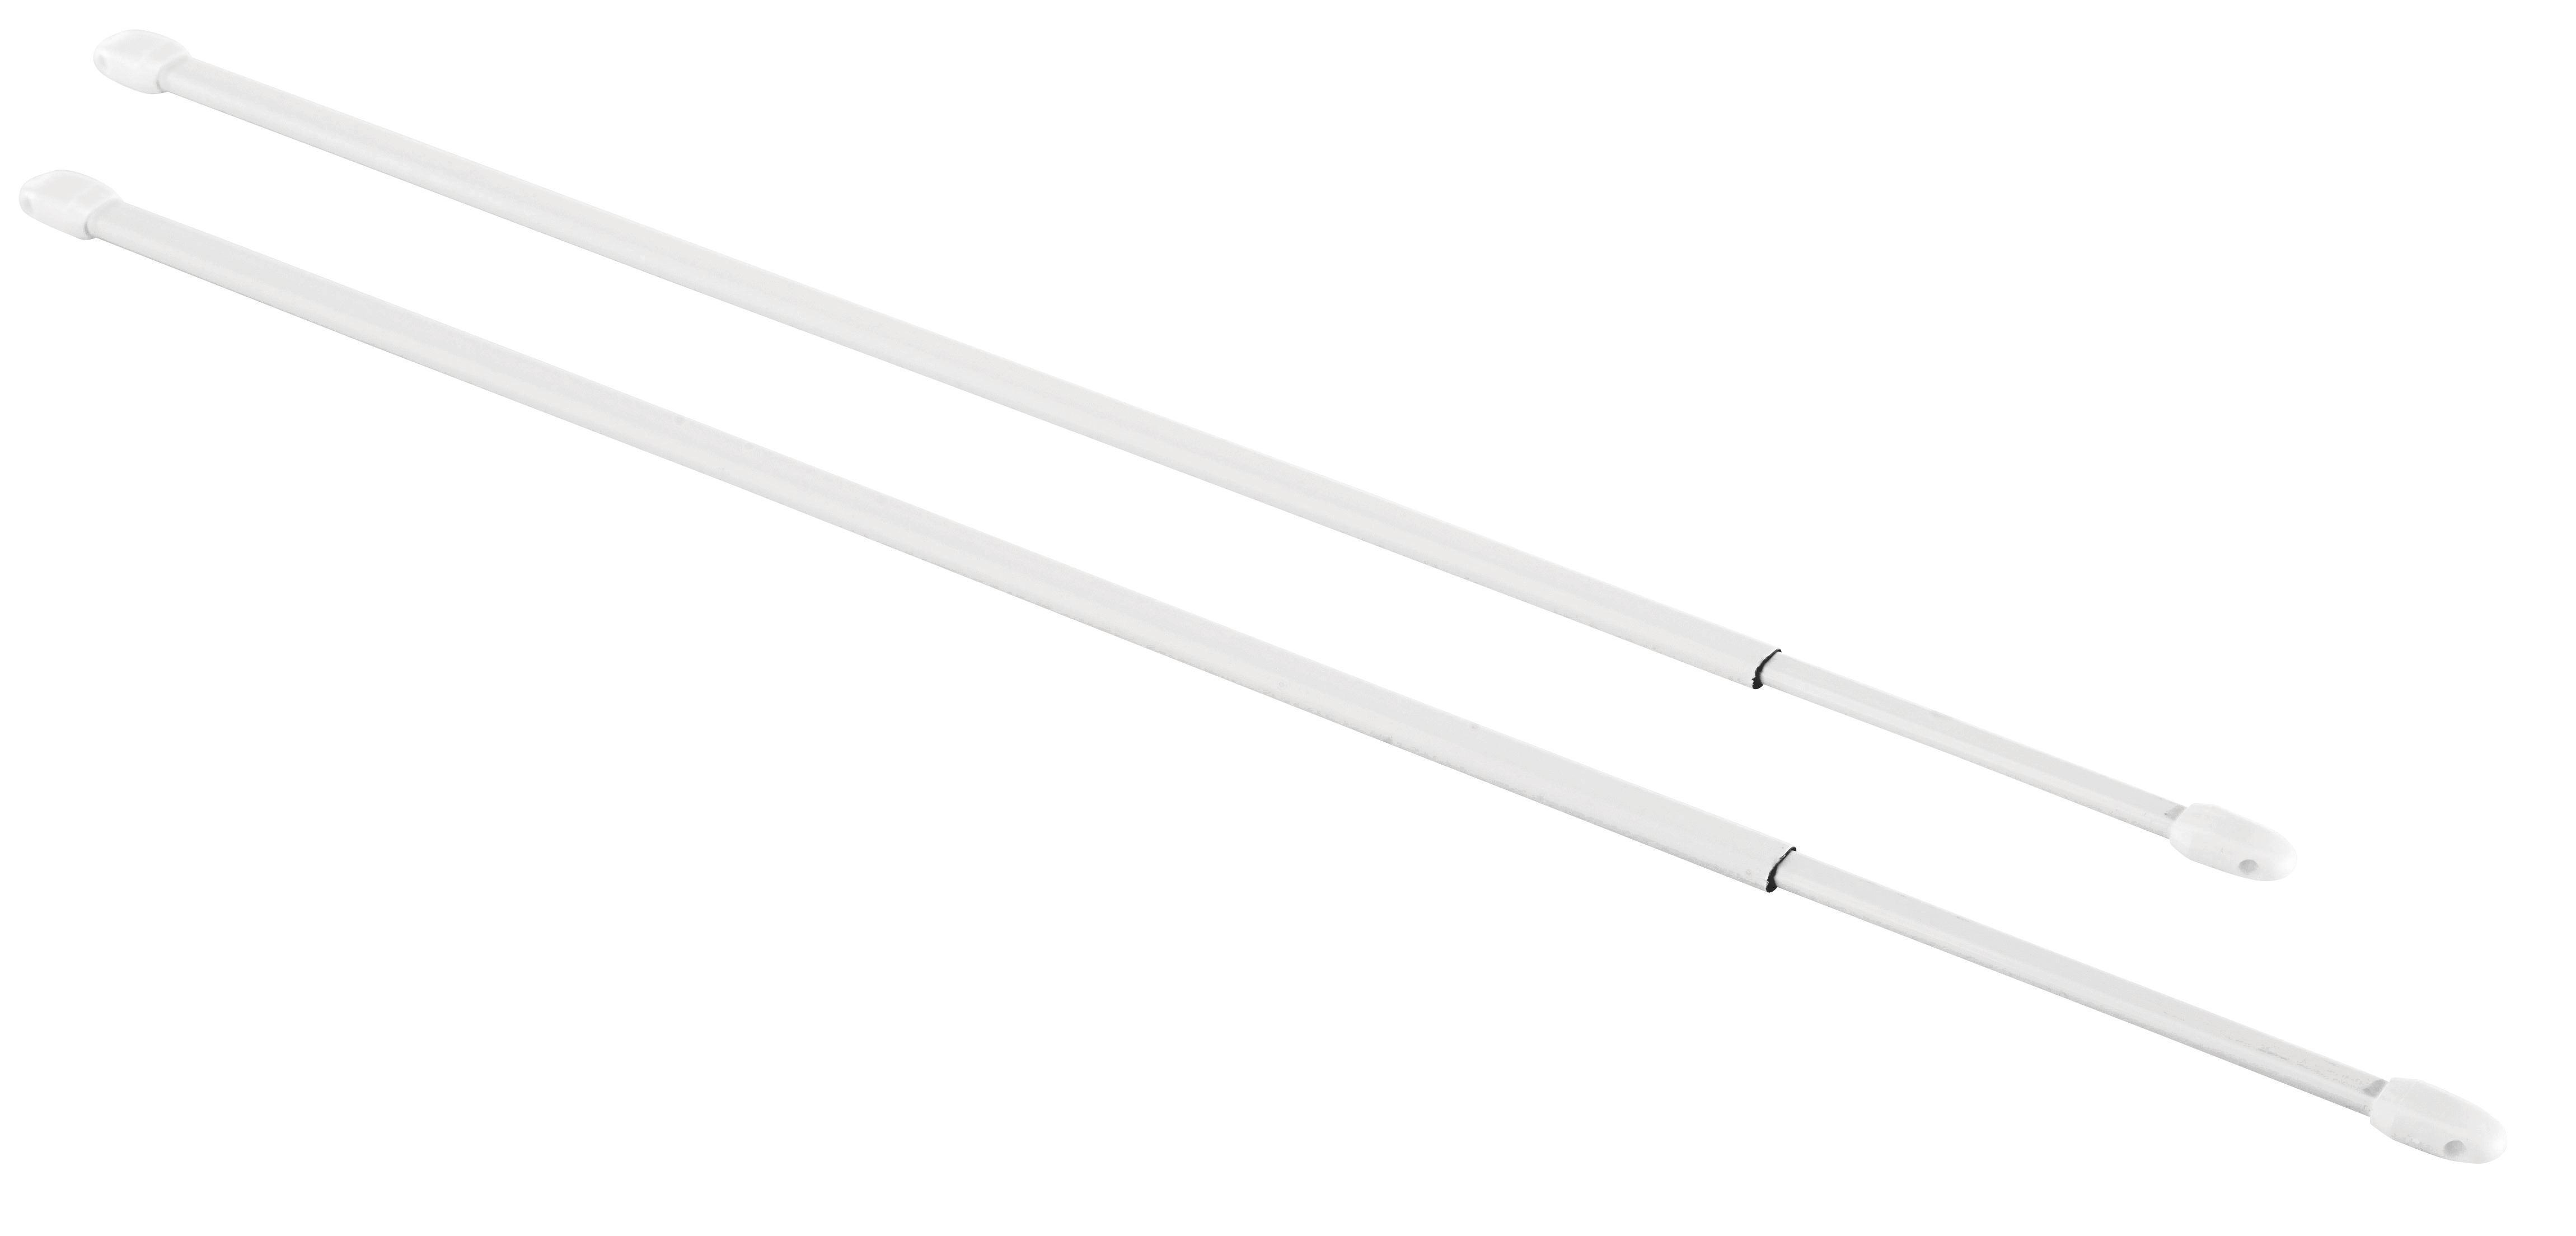 Vitragenstange Simple in Weiß, ca. 40-70cm - Weiß, Kunststoff (40-70cm) - MÖMAX modern living